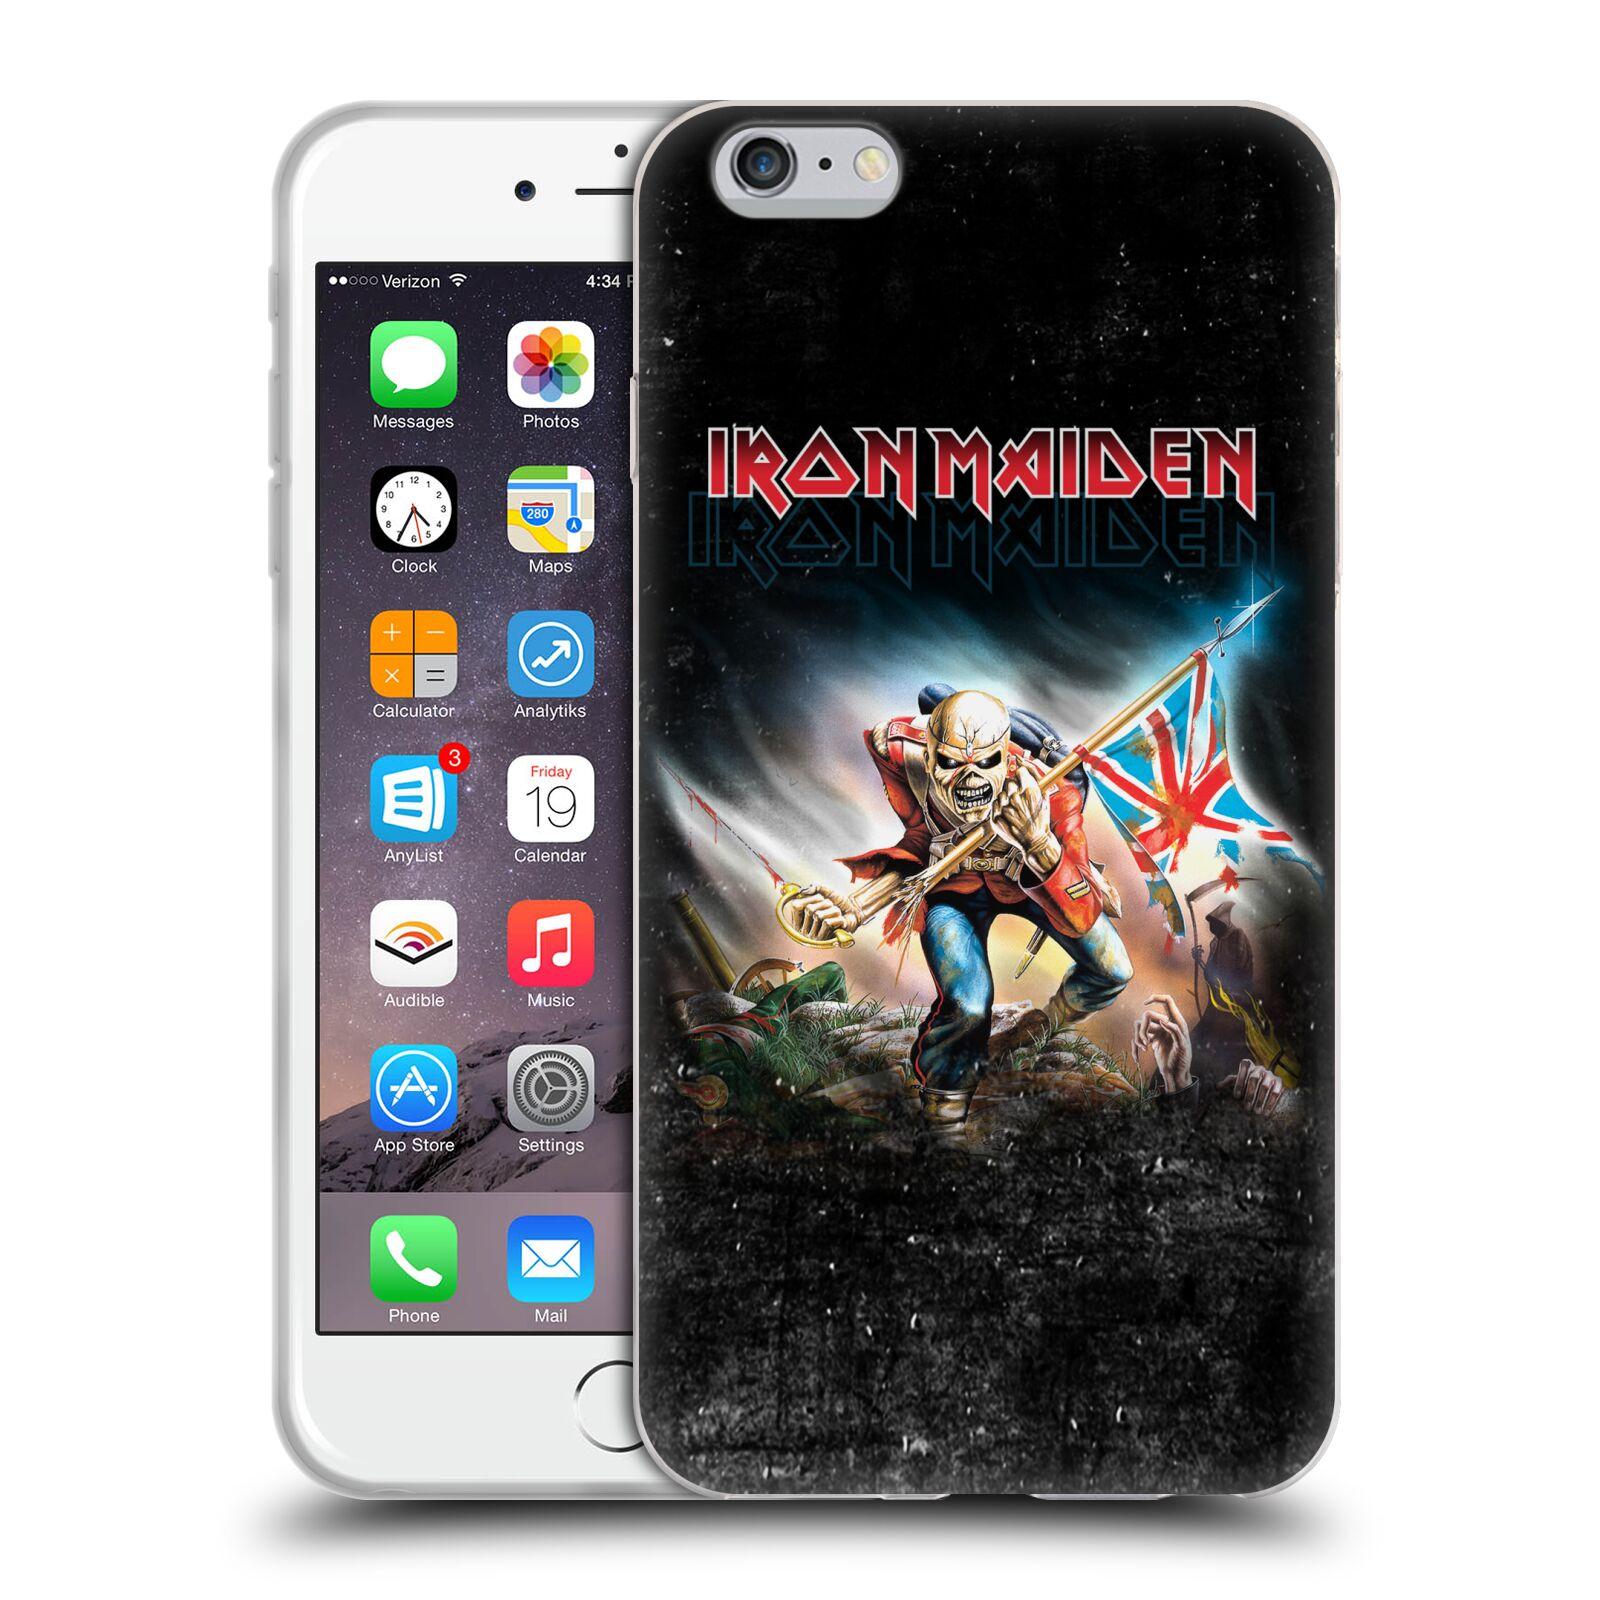 HEAD CASE silikonový obal na mobil Apple Iphone 6/6S PLUS Heavymetalová skupina Iron Maiden bojovník